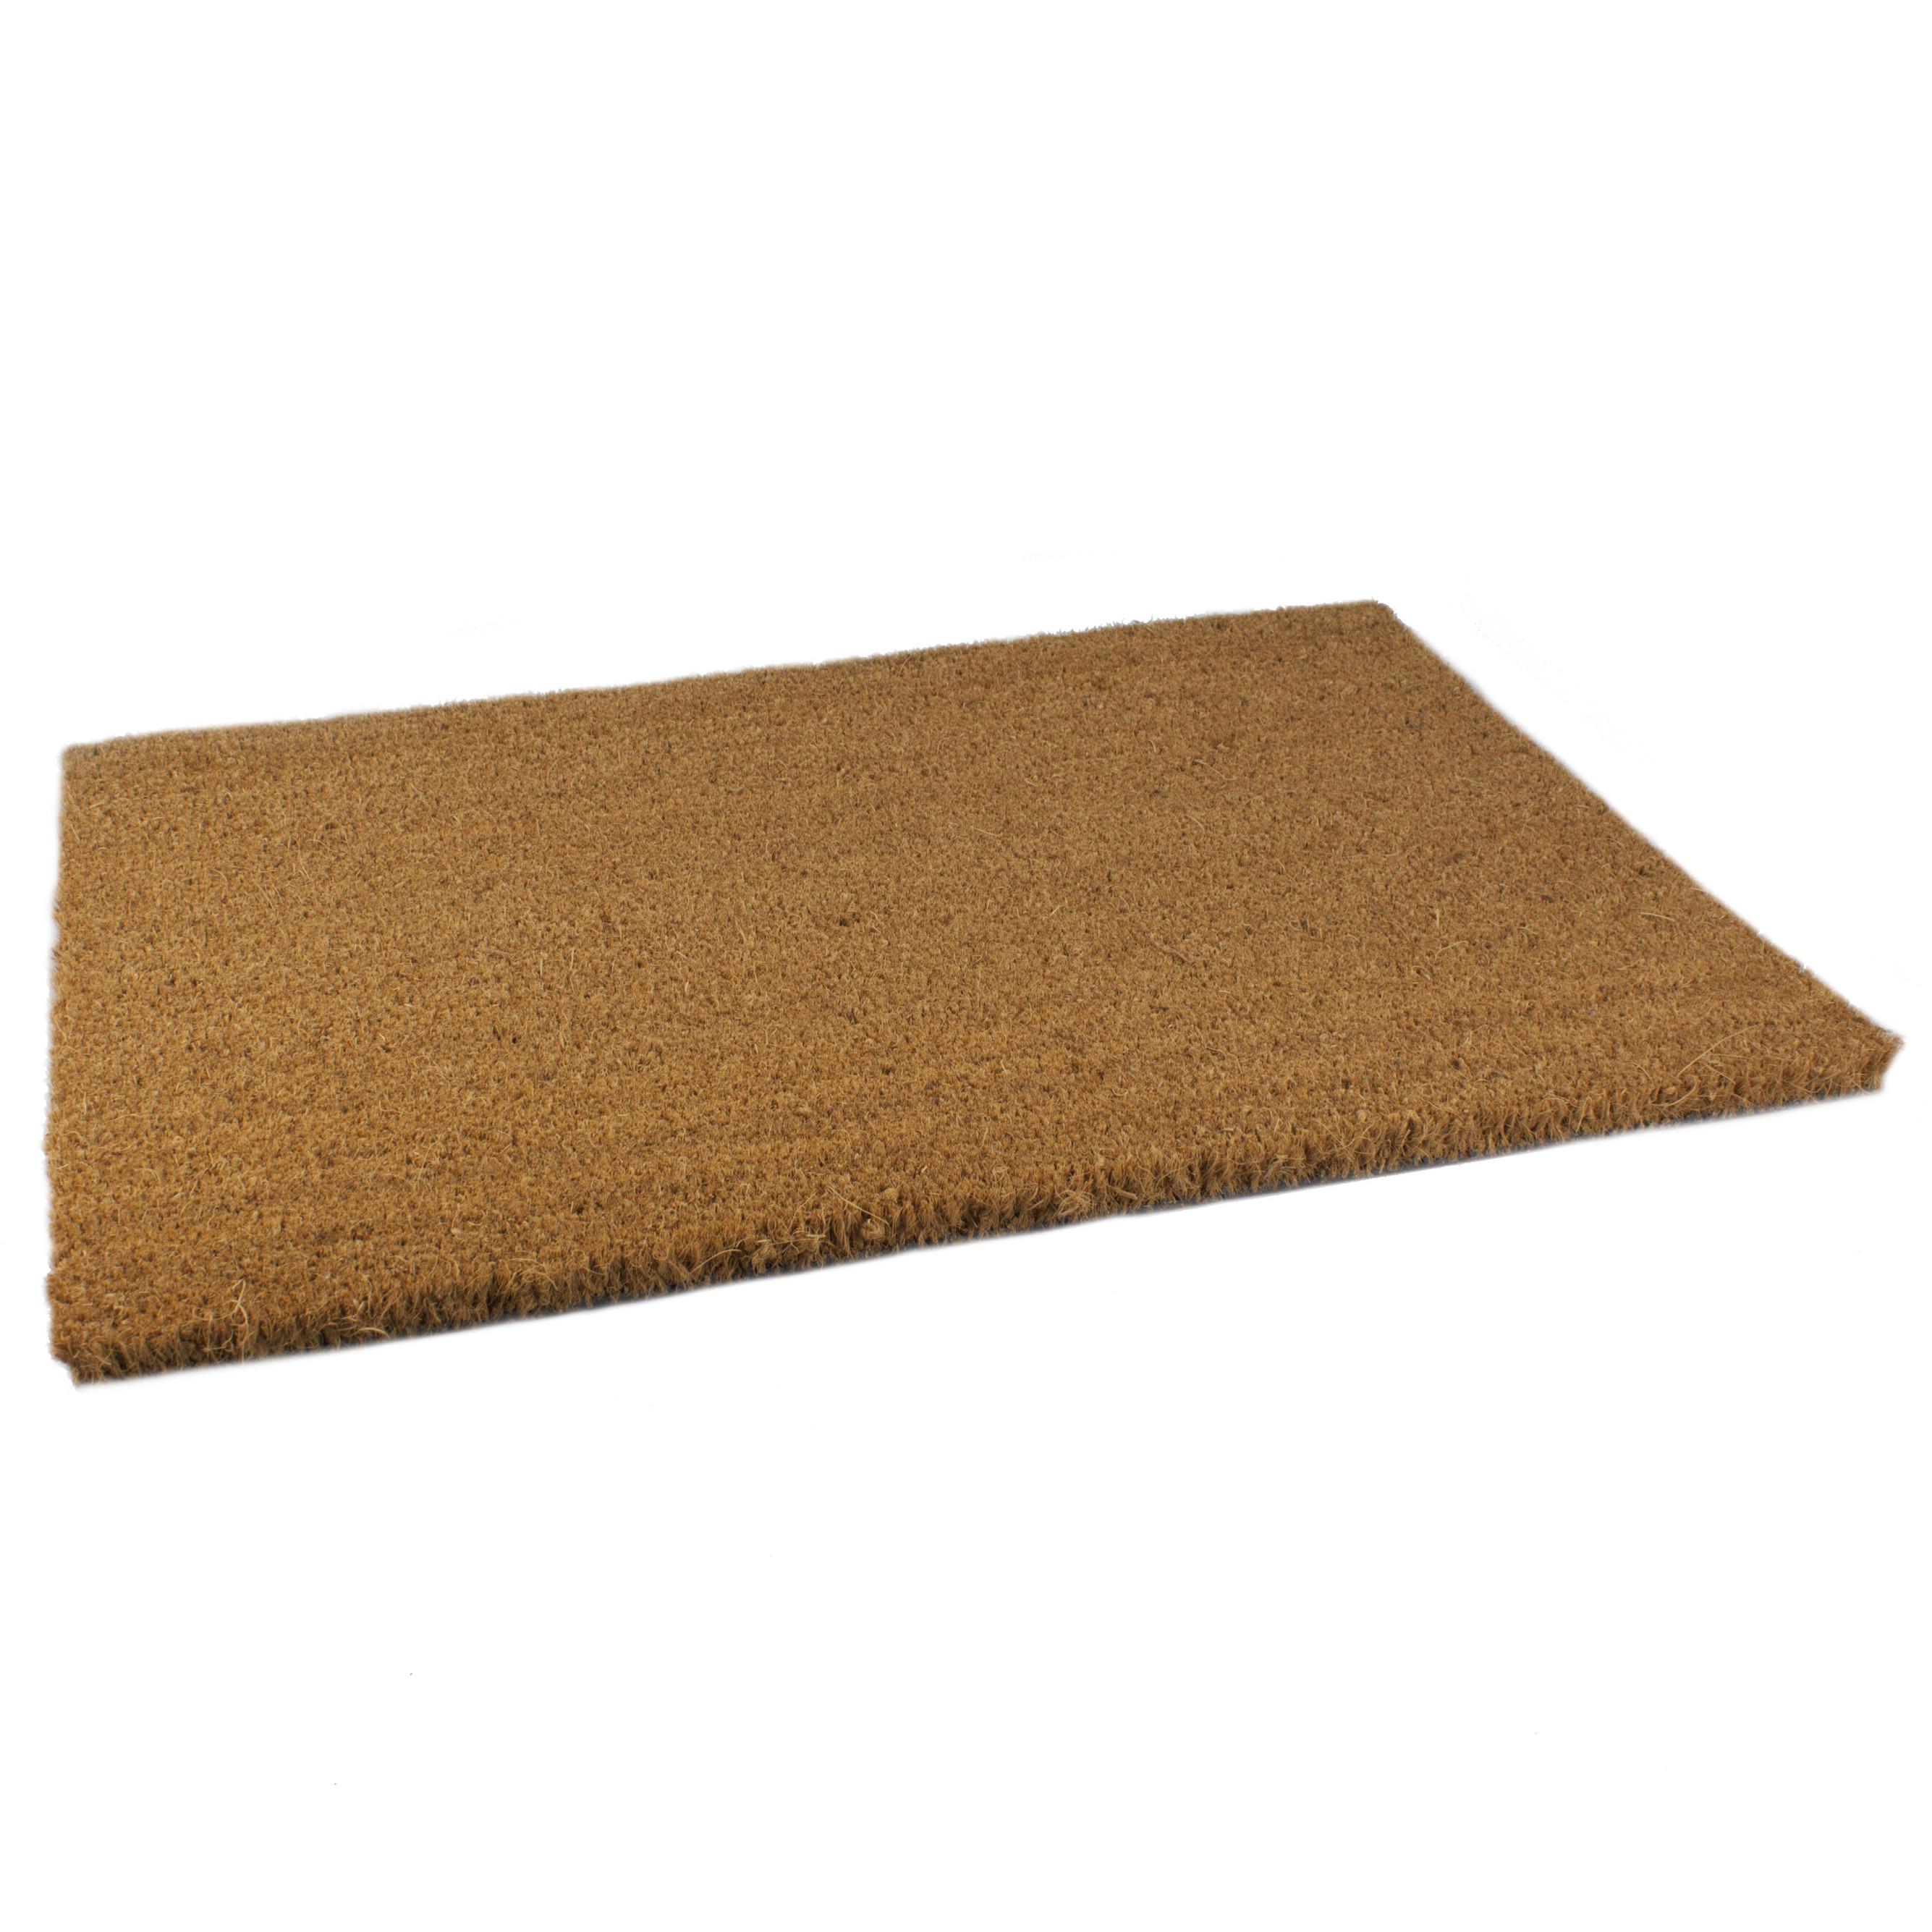 Anti sllip deurmat-vloermat pvc-kokos bruin 60 x 40 cm voor binnen